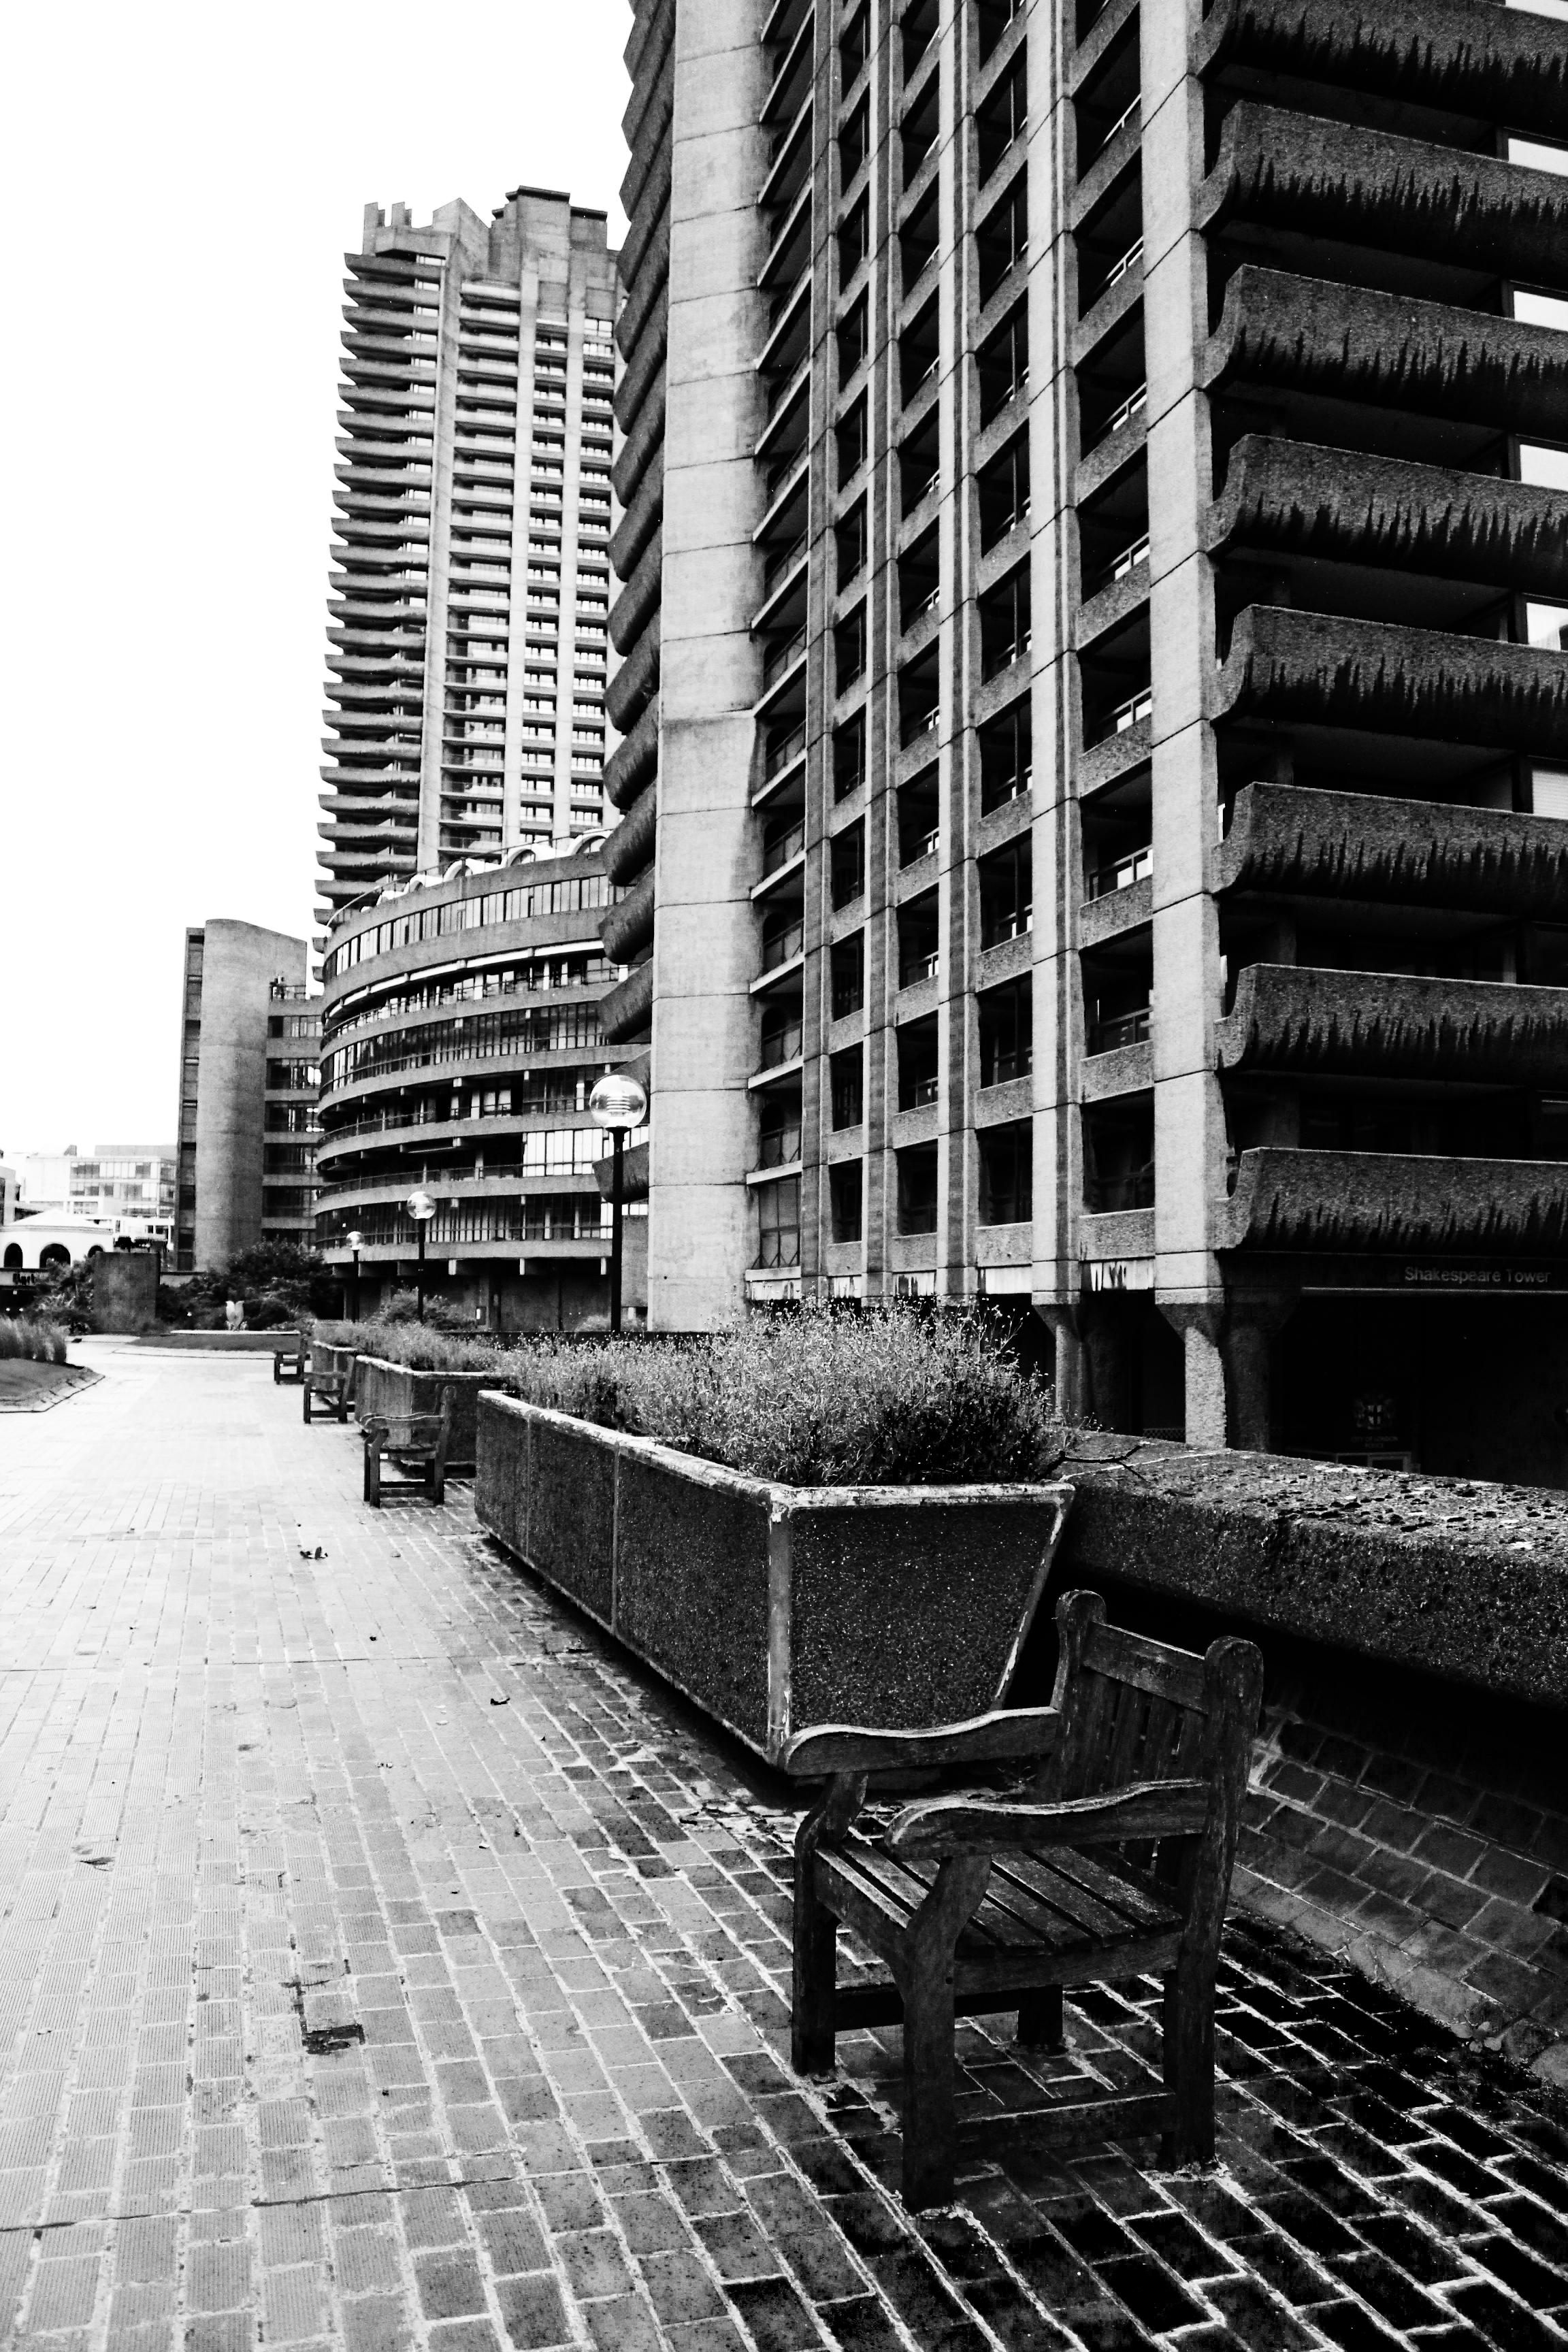 The Barbican, London - Photo Essay by Amit Khanna (6).jpg